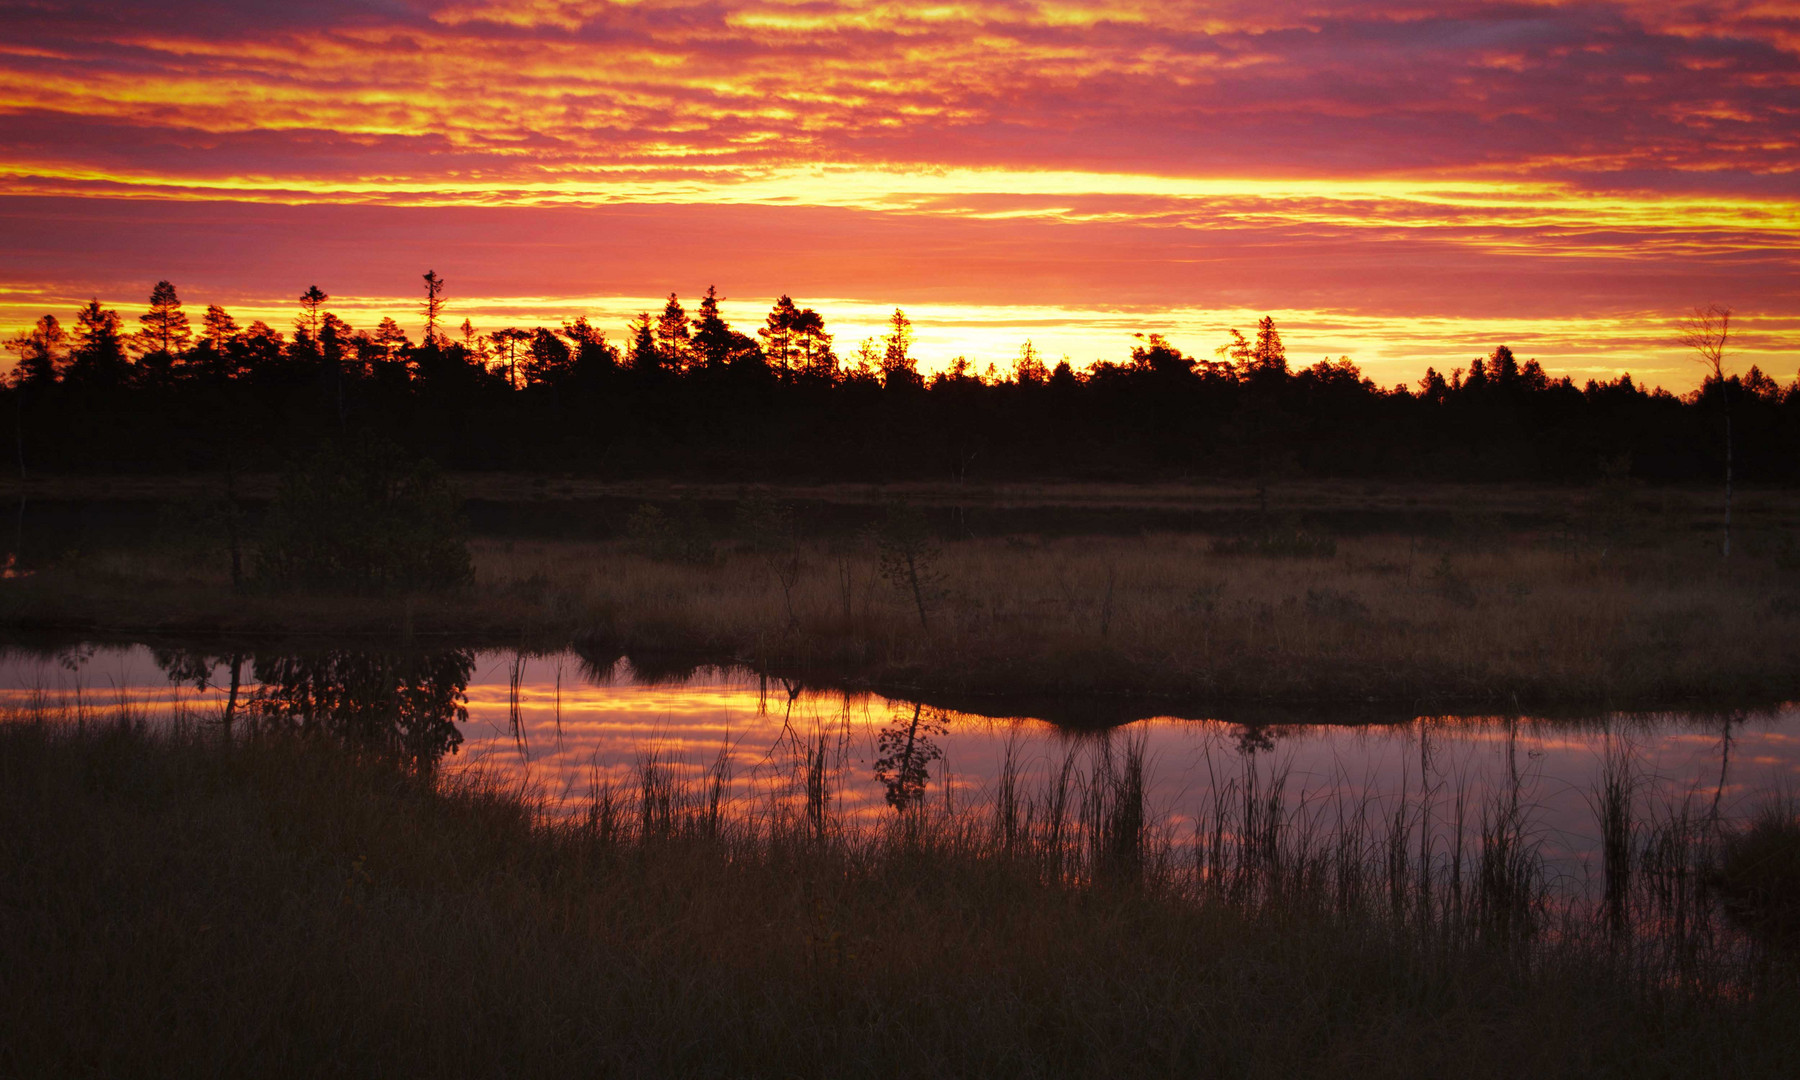 Sonnenaufgang am Wildsee